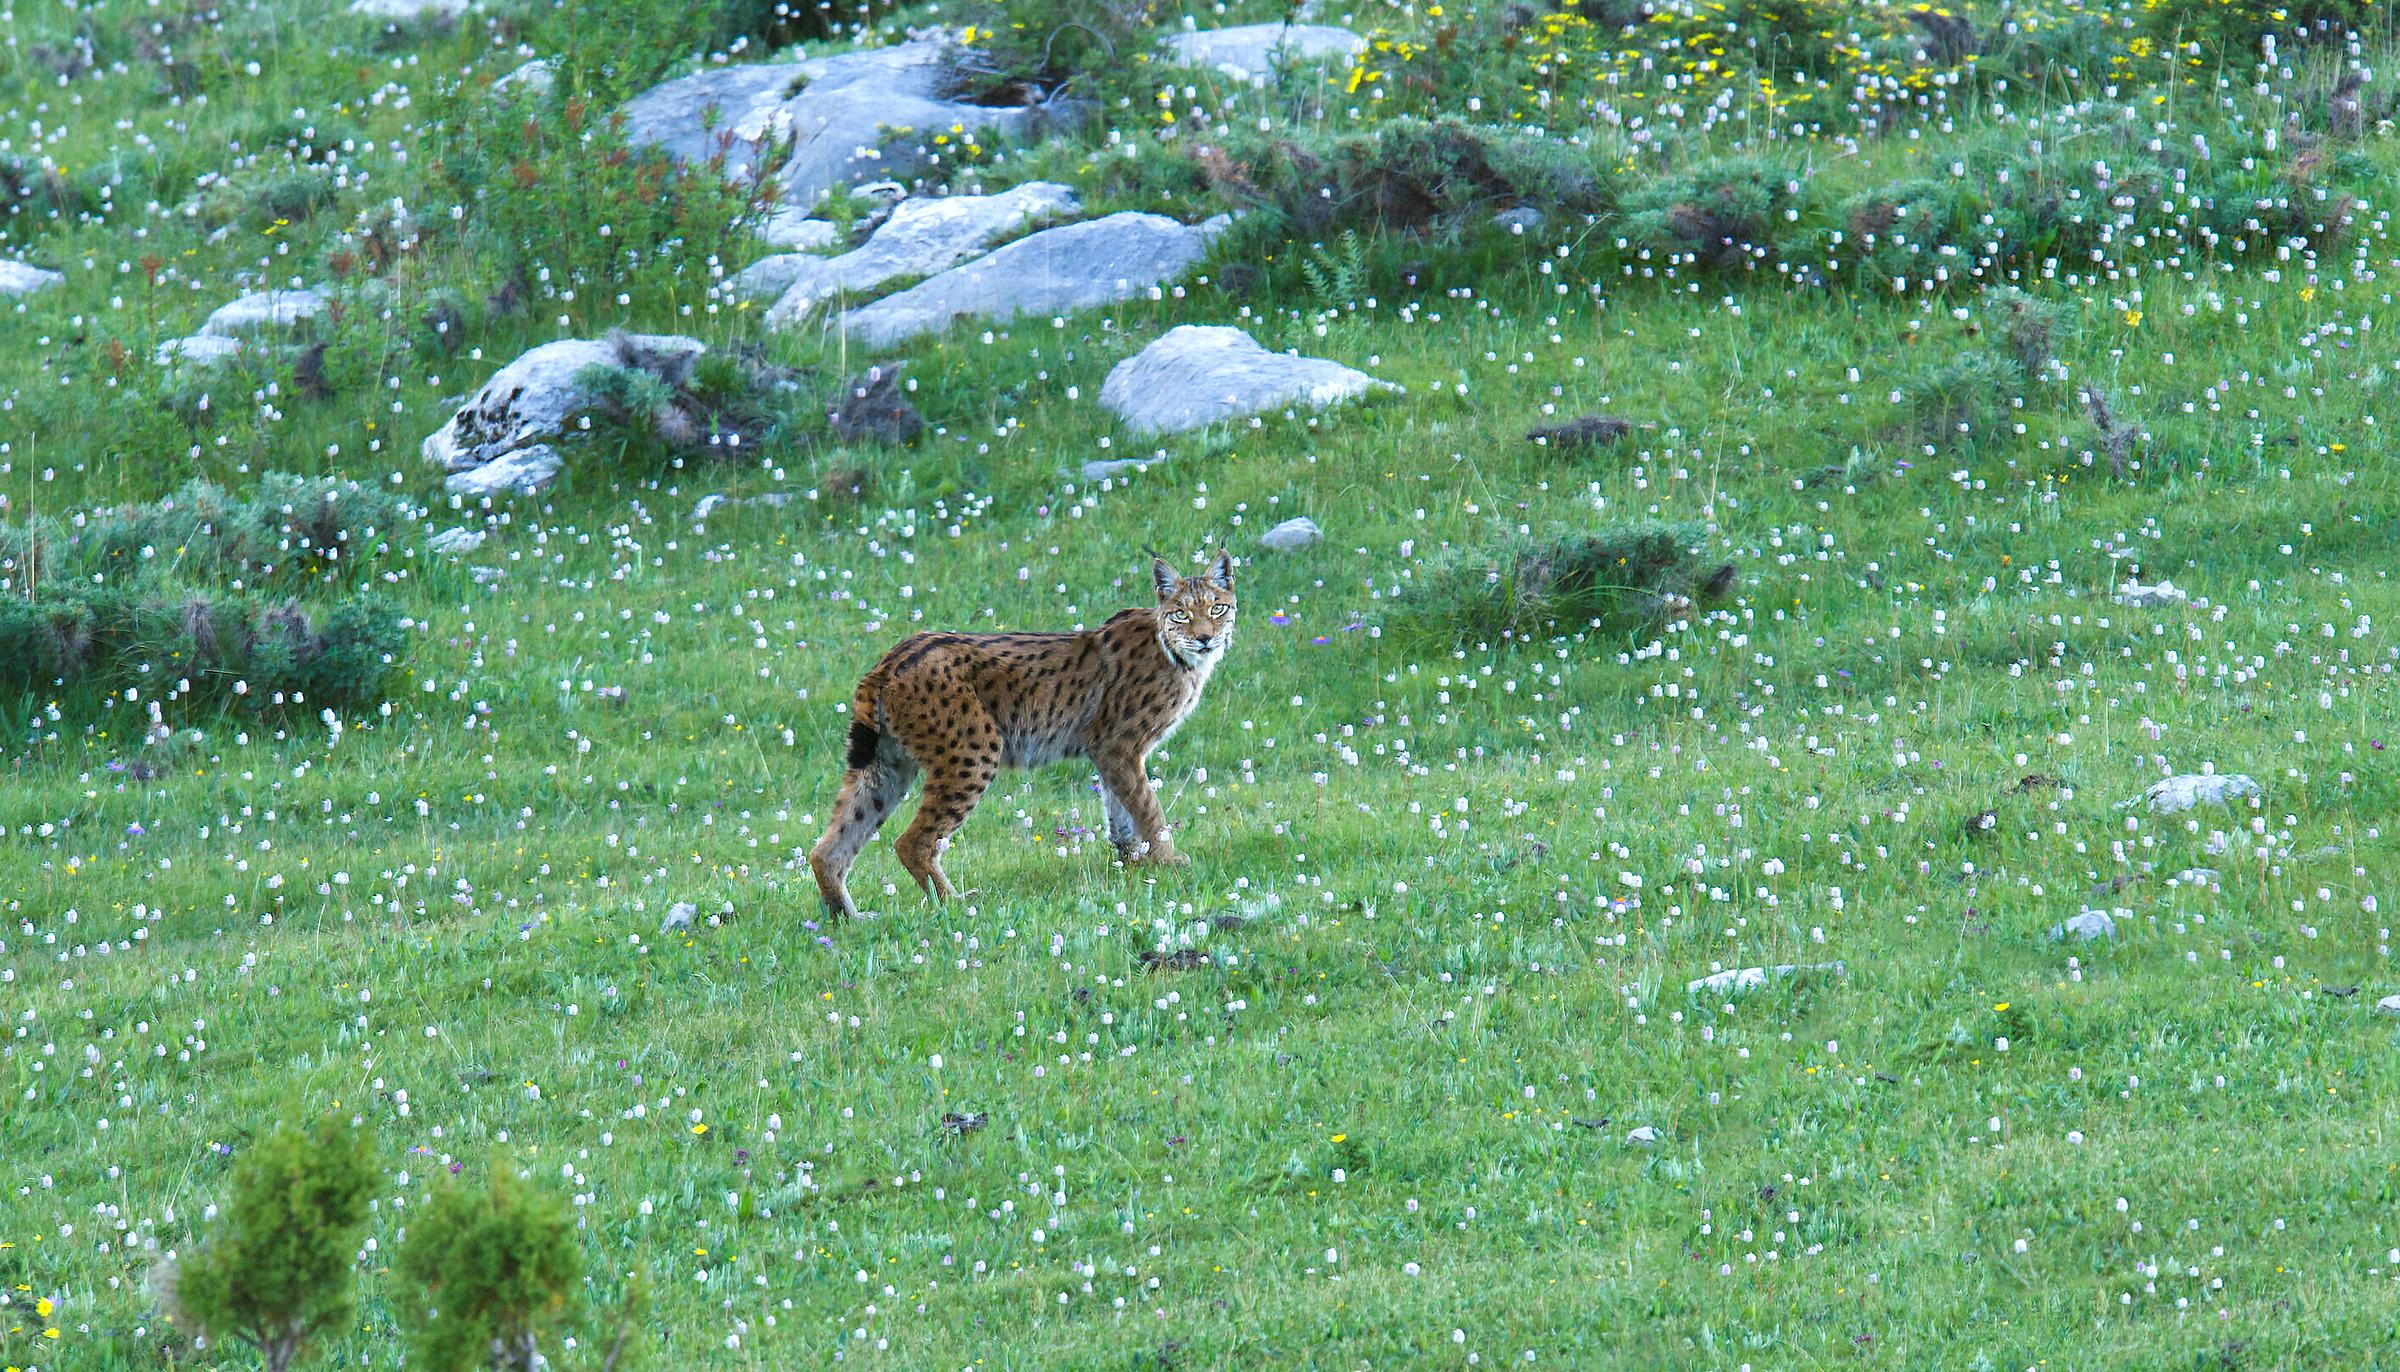 Tibetan Lynx (Lynx lynx isabellinus), Kanda Mountain, Yushu Prefecture, Qinghai, China. 14 July 2016. Elev. 4550 m.